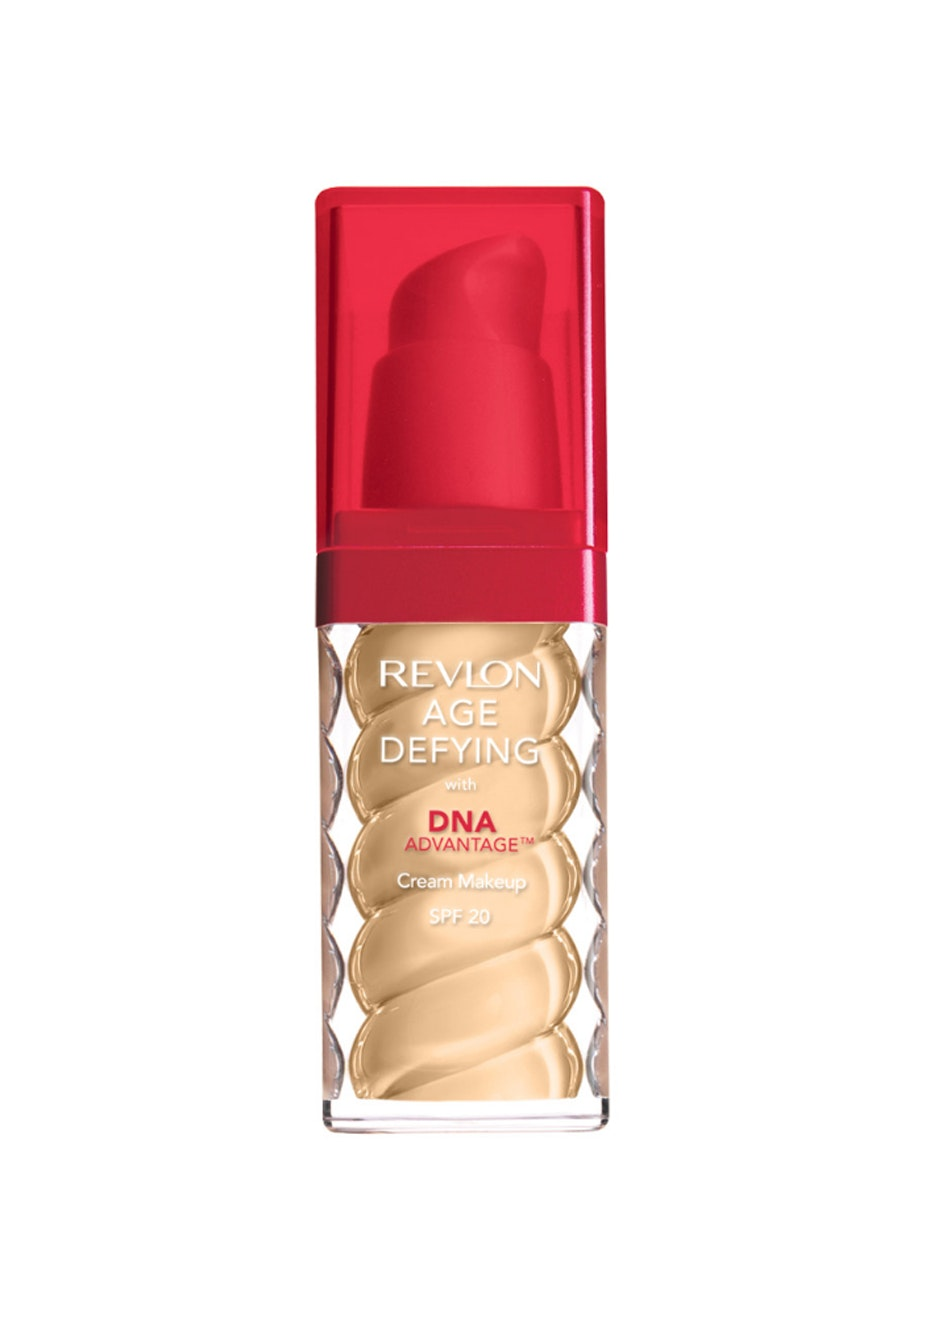 Revlon Age Defying DNA Advantage Cream Liquid Makeup Fresh Ivory